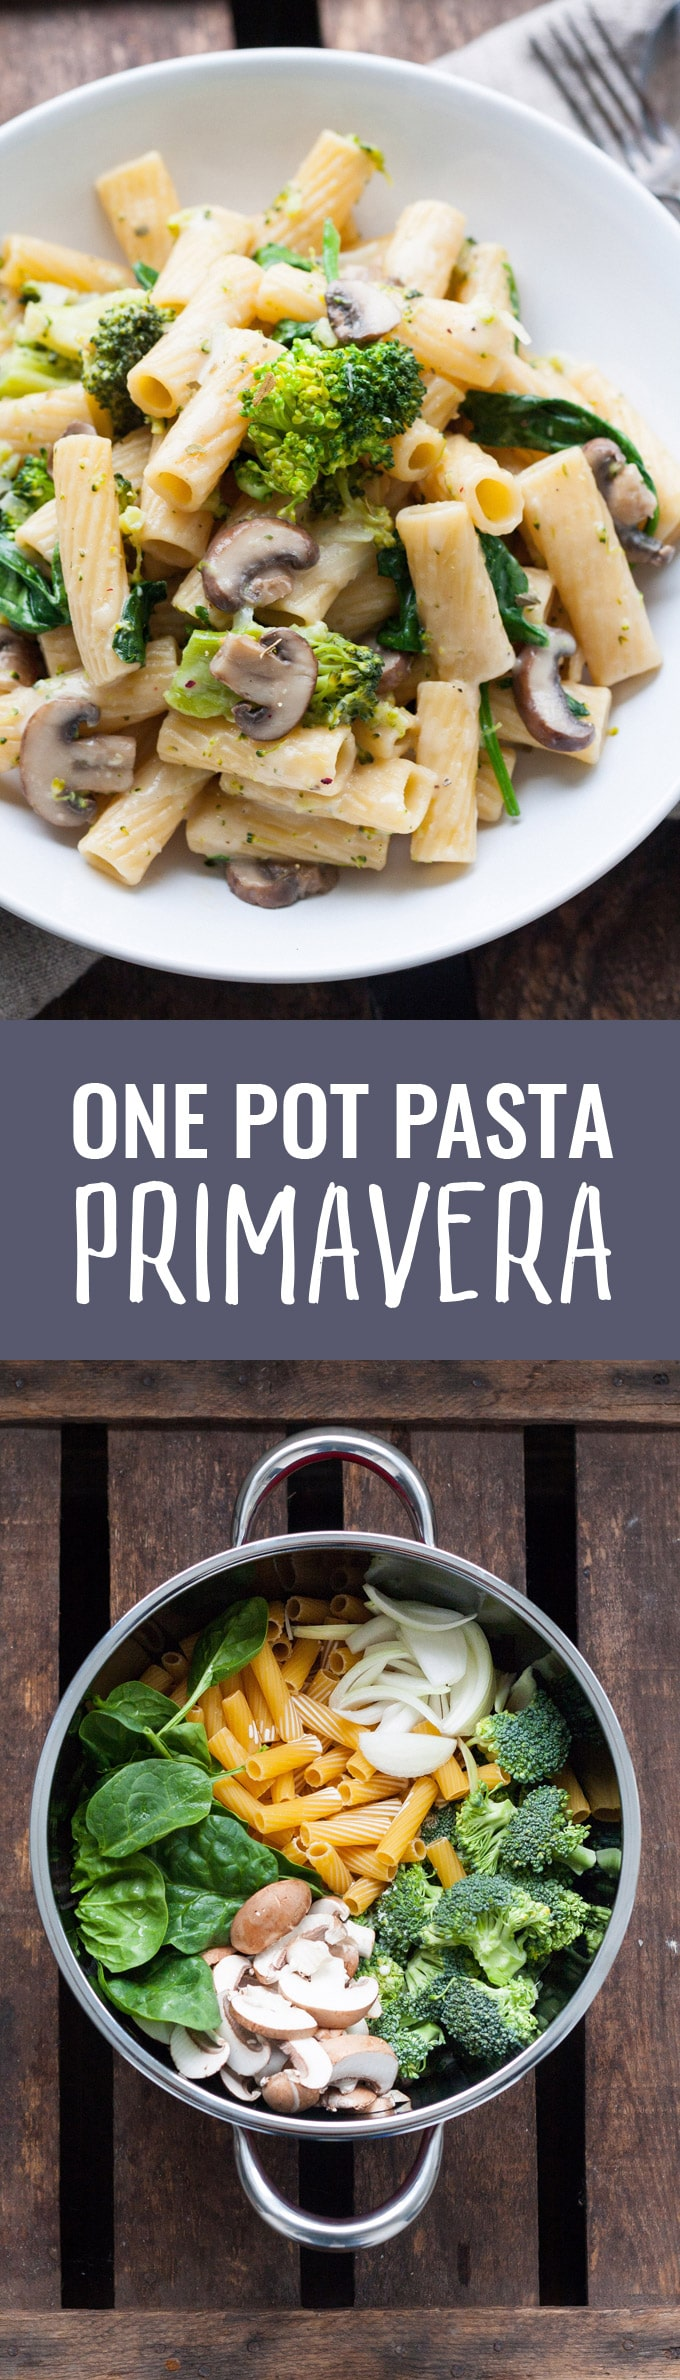 One-Pot-Pasta-Primavera-Pinterest